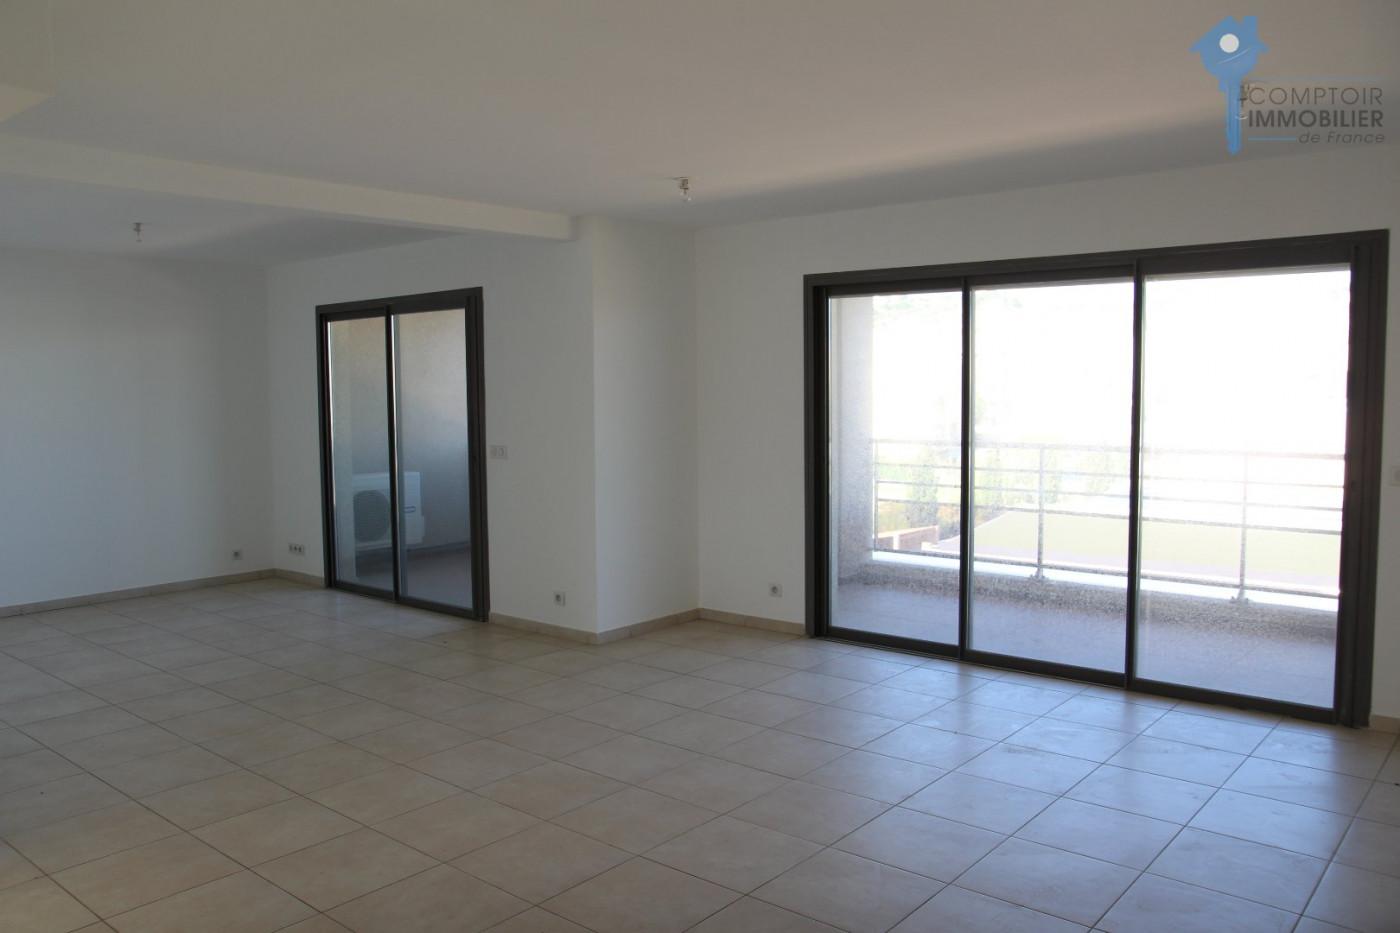 A vendre Calvi 3438033292 Comptoir immobilier corse